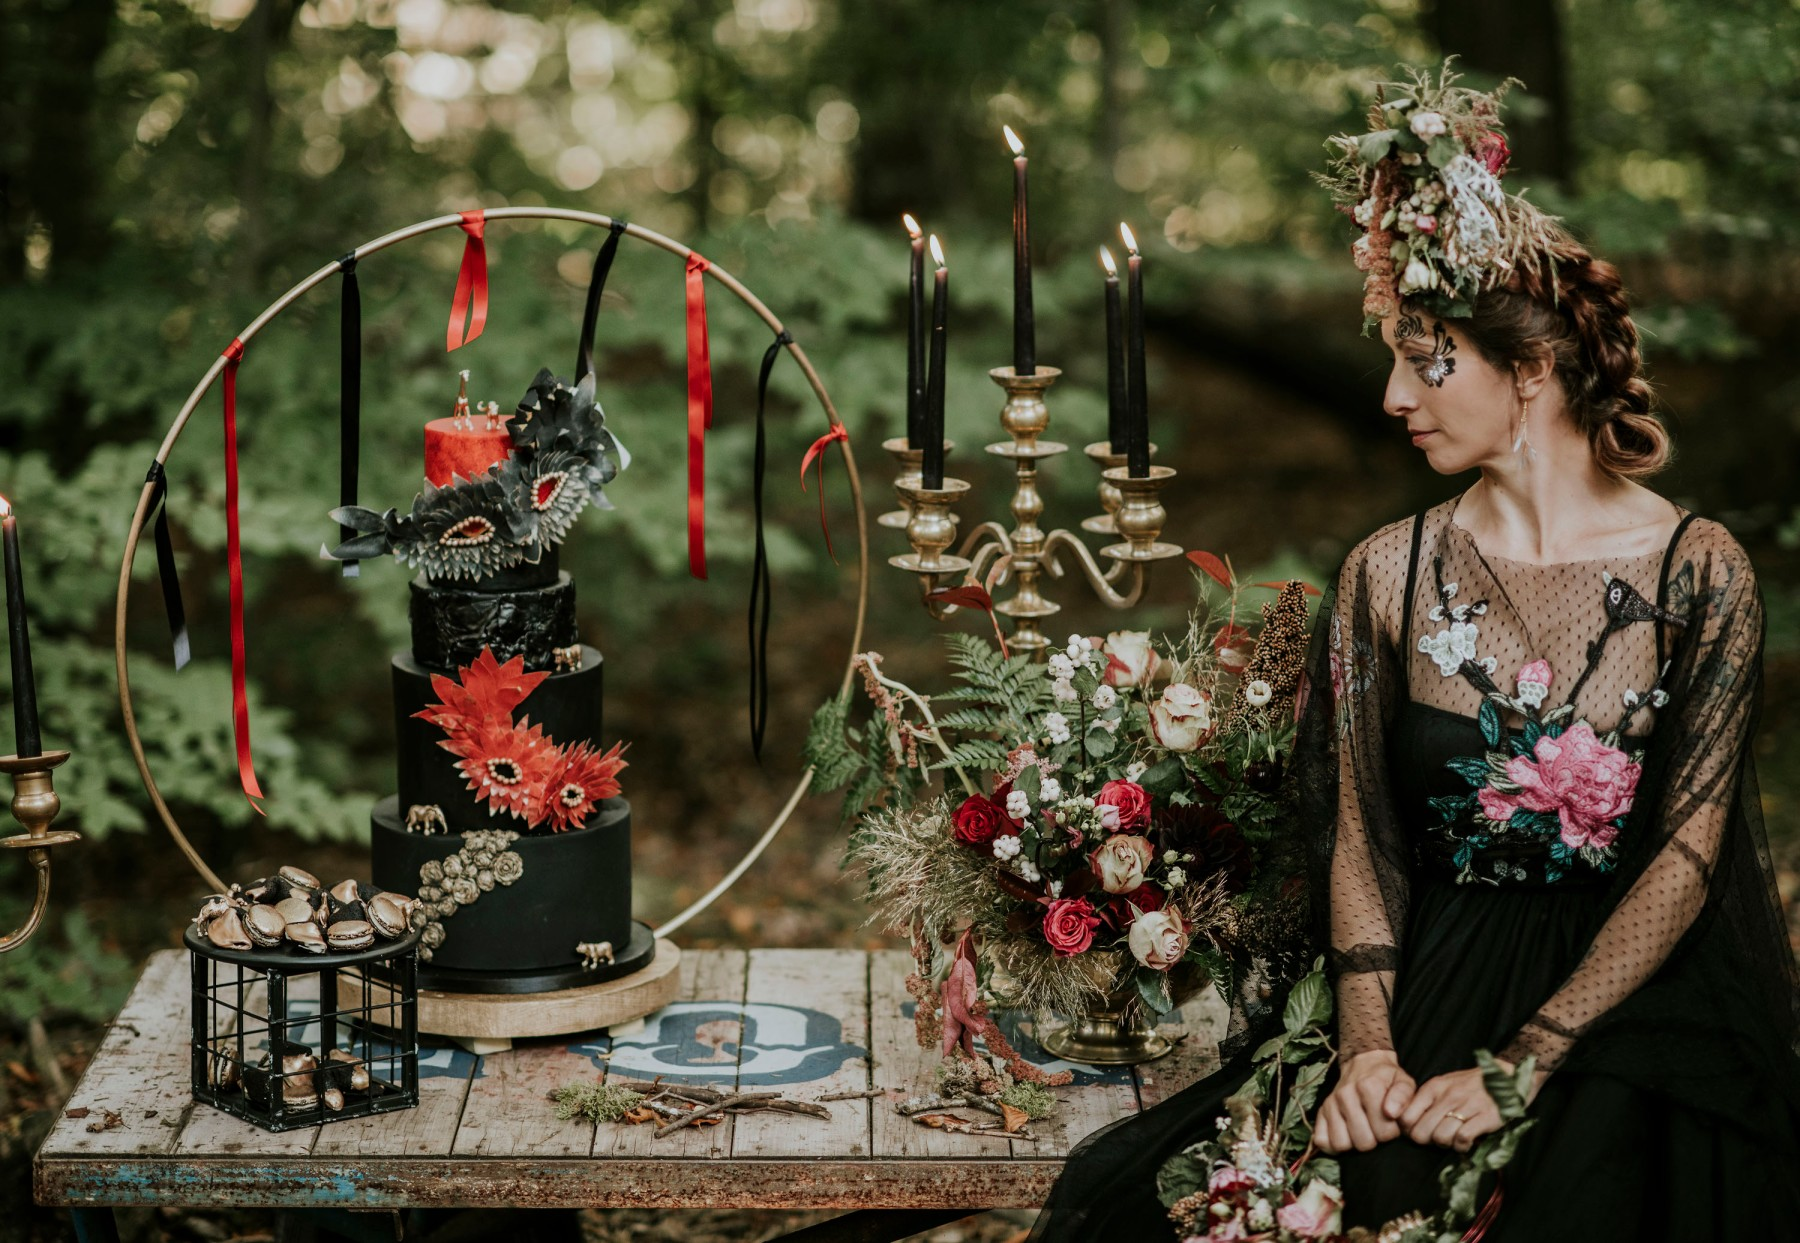 quirky circus wedding - black and red wedding cake - black wedding dress - alternative wedding decor